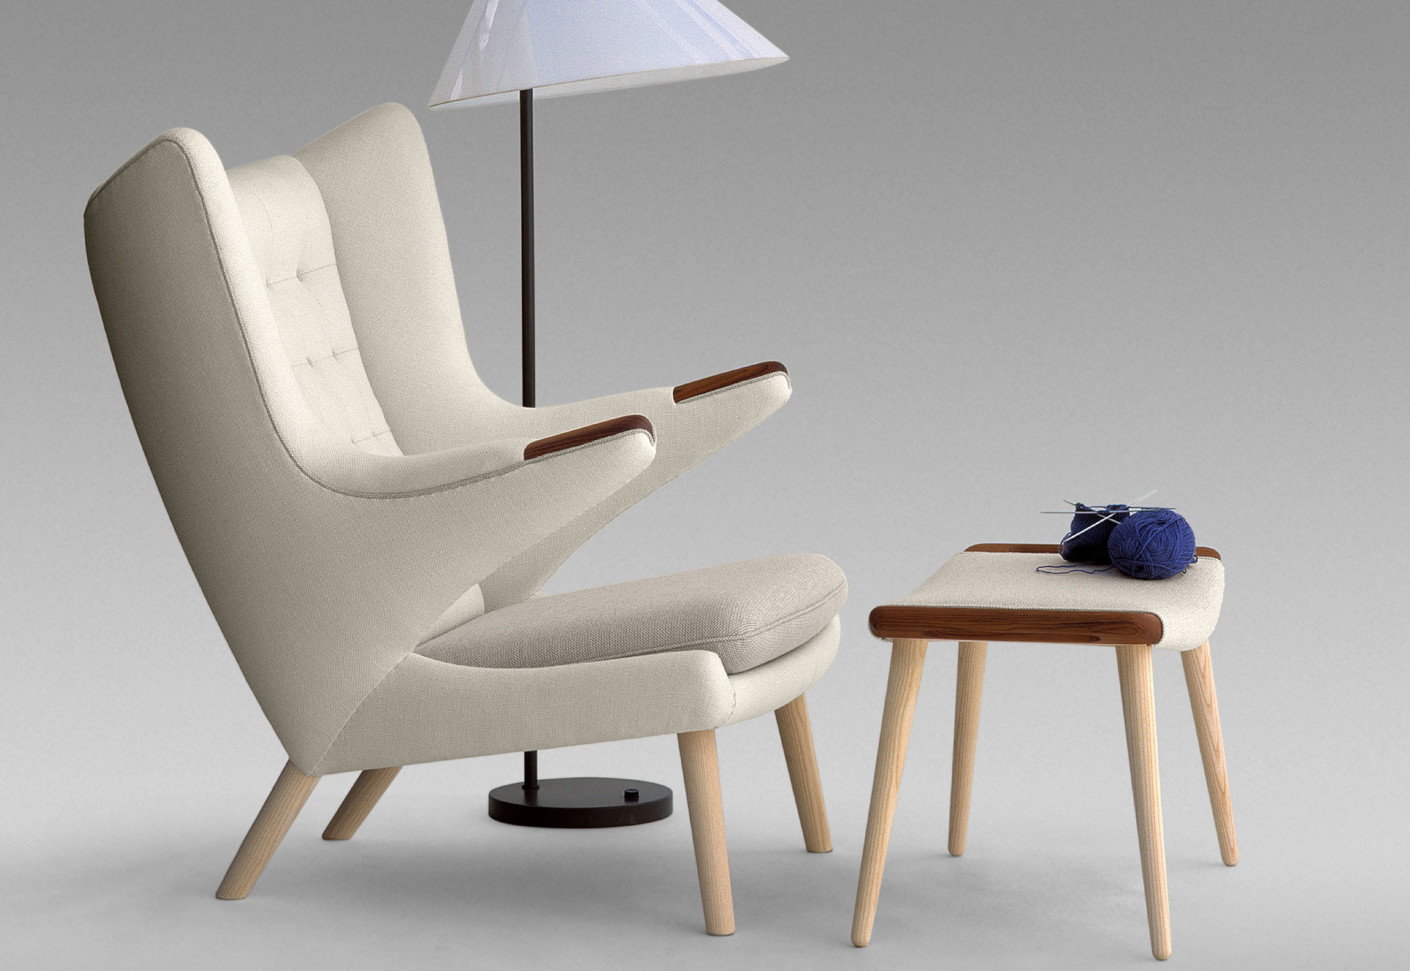 pp 19 the teddy bear chair by pp m bler stylepark. Black Bedroom Furniture Sets. Home Design Ideas